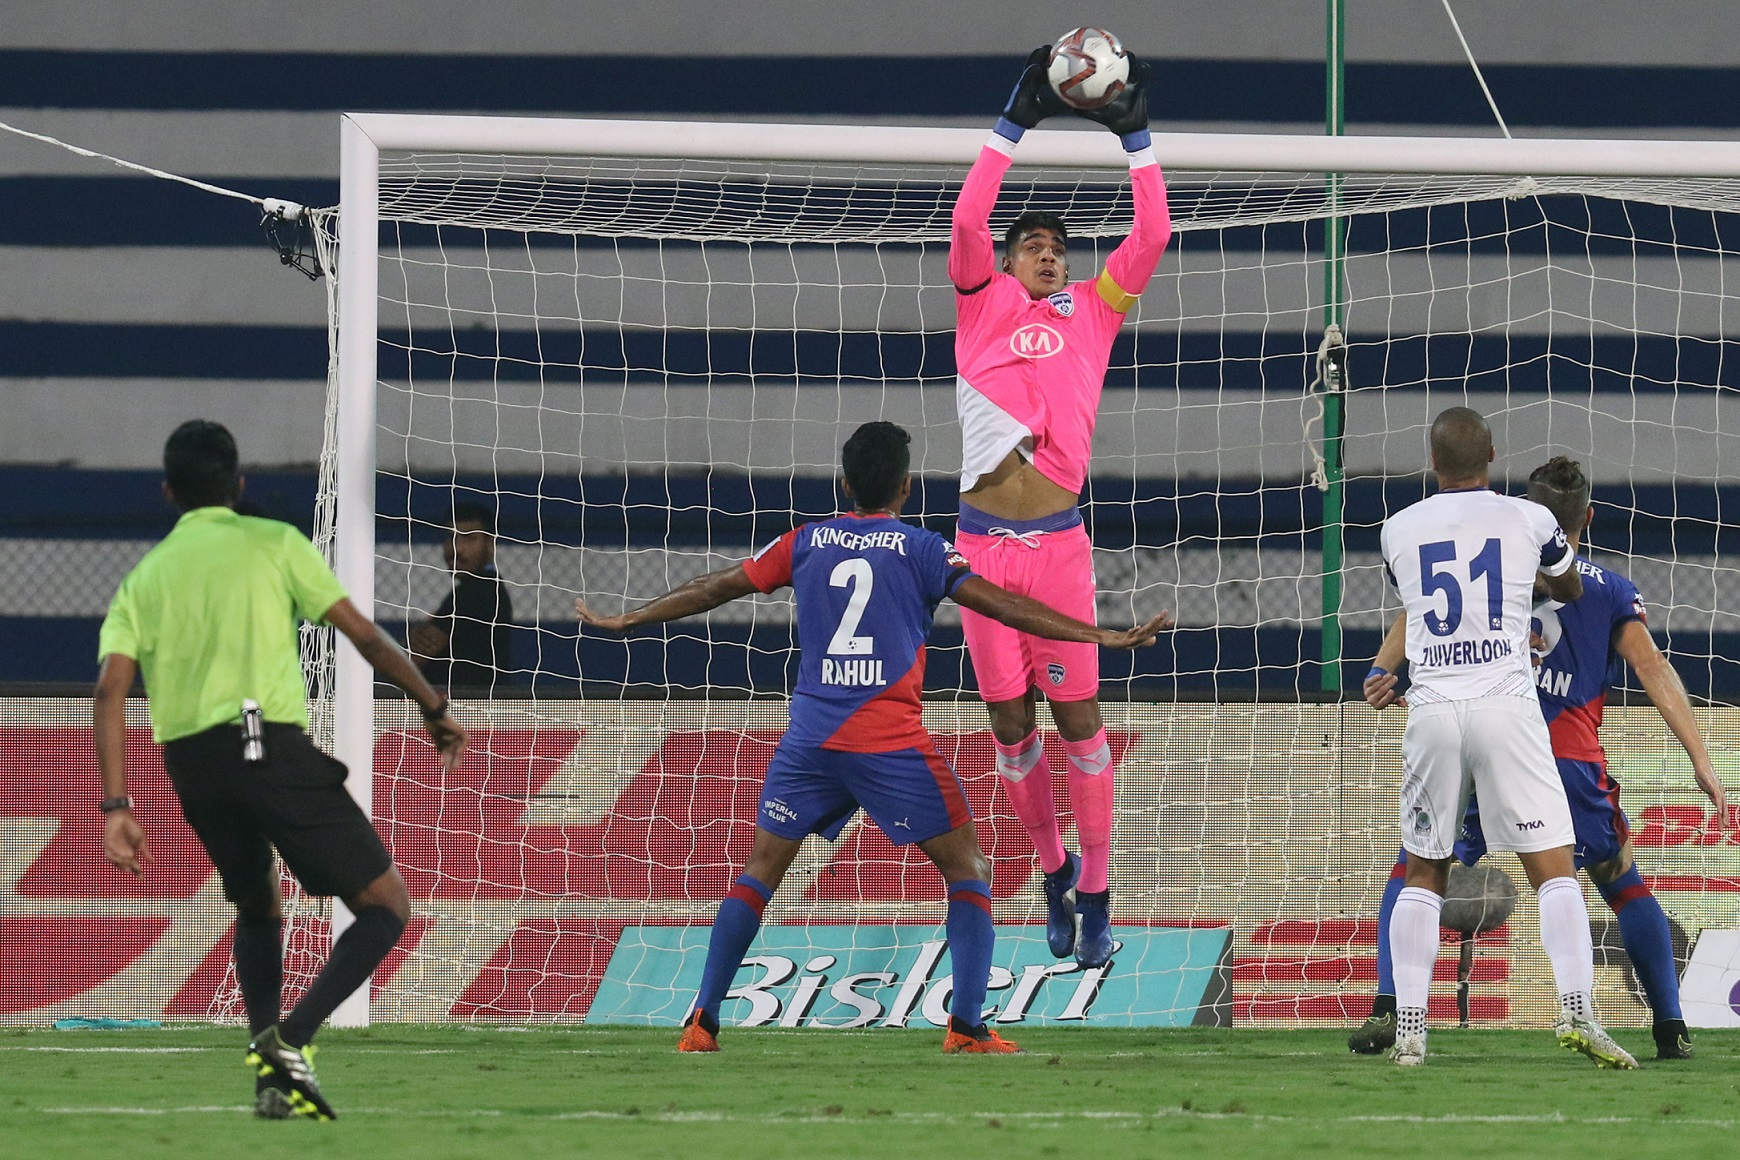 Bengaluru Delhi Dynamos